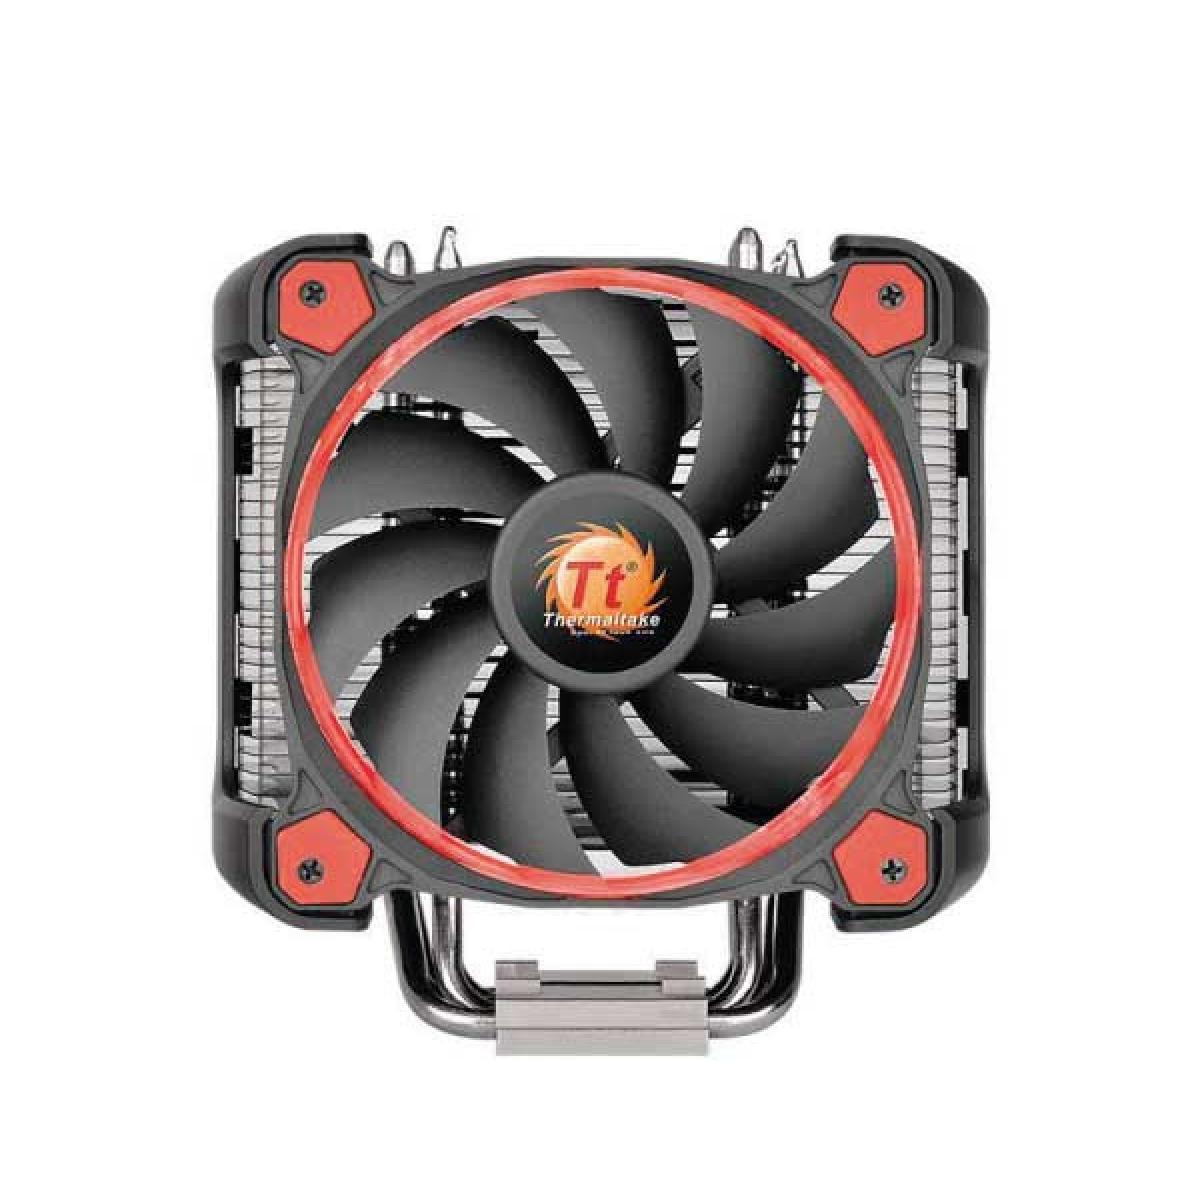 Cooler para Processador Thermaltake Riing SILENT 12 PRO, Red 120mm, Intel-AMD, CL-P021-CA12RE-A